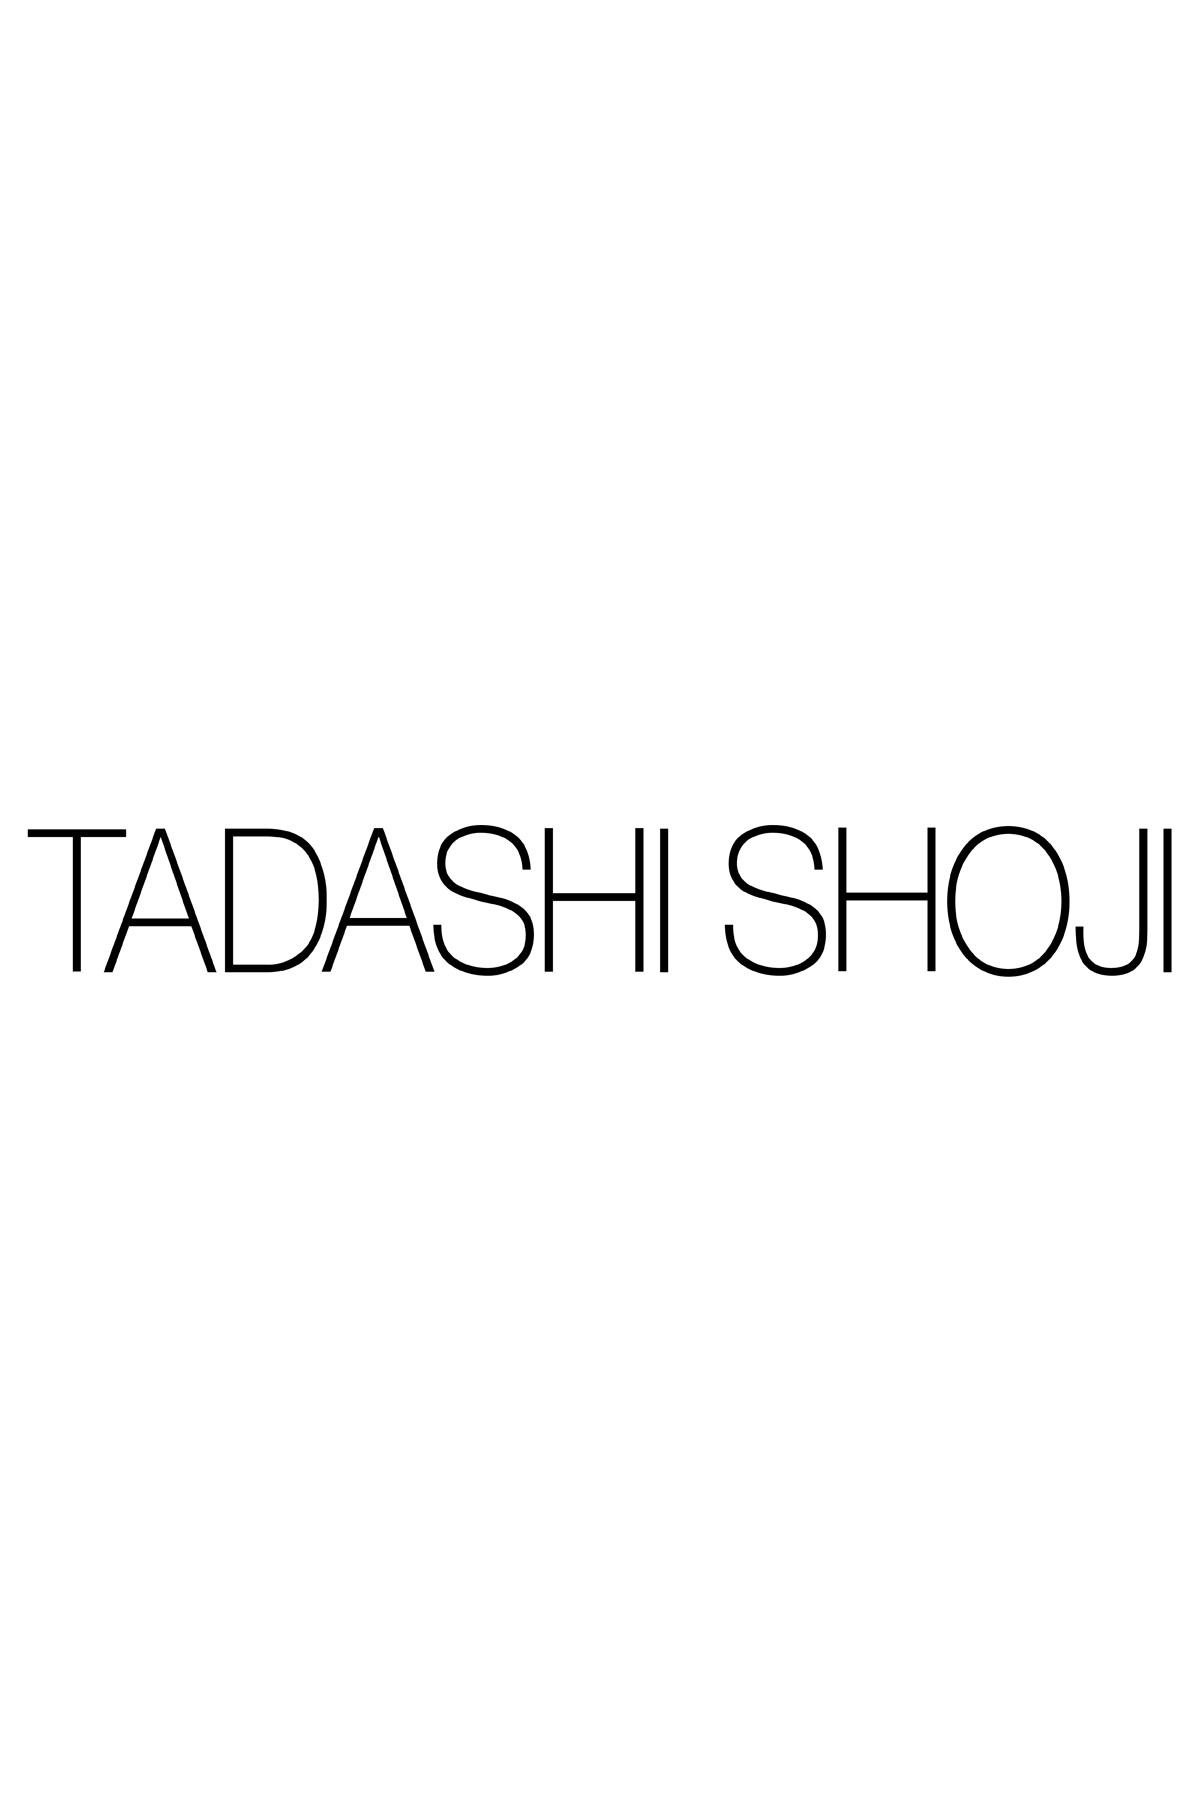 Tadashi Shoji - Blouson Waist Paillette Embroidered Lace Dress - Detail